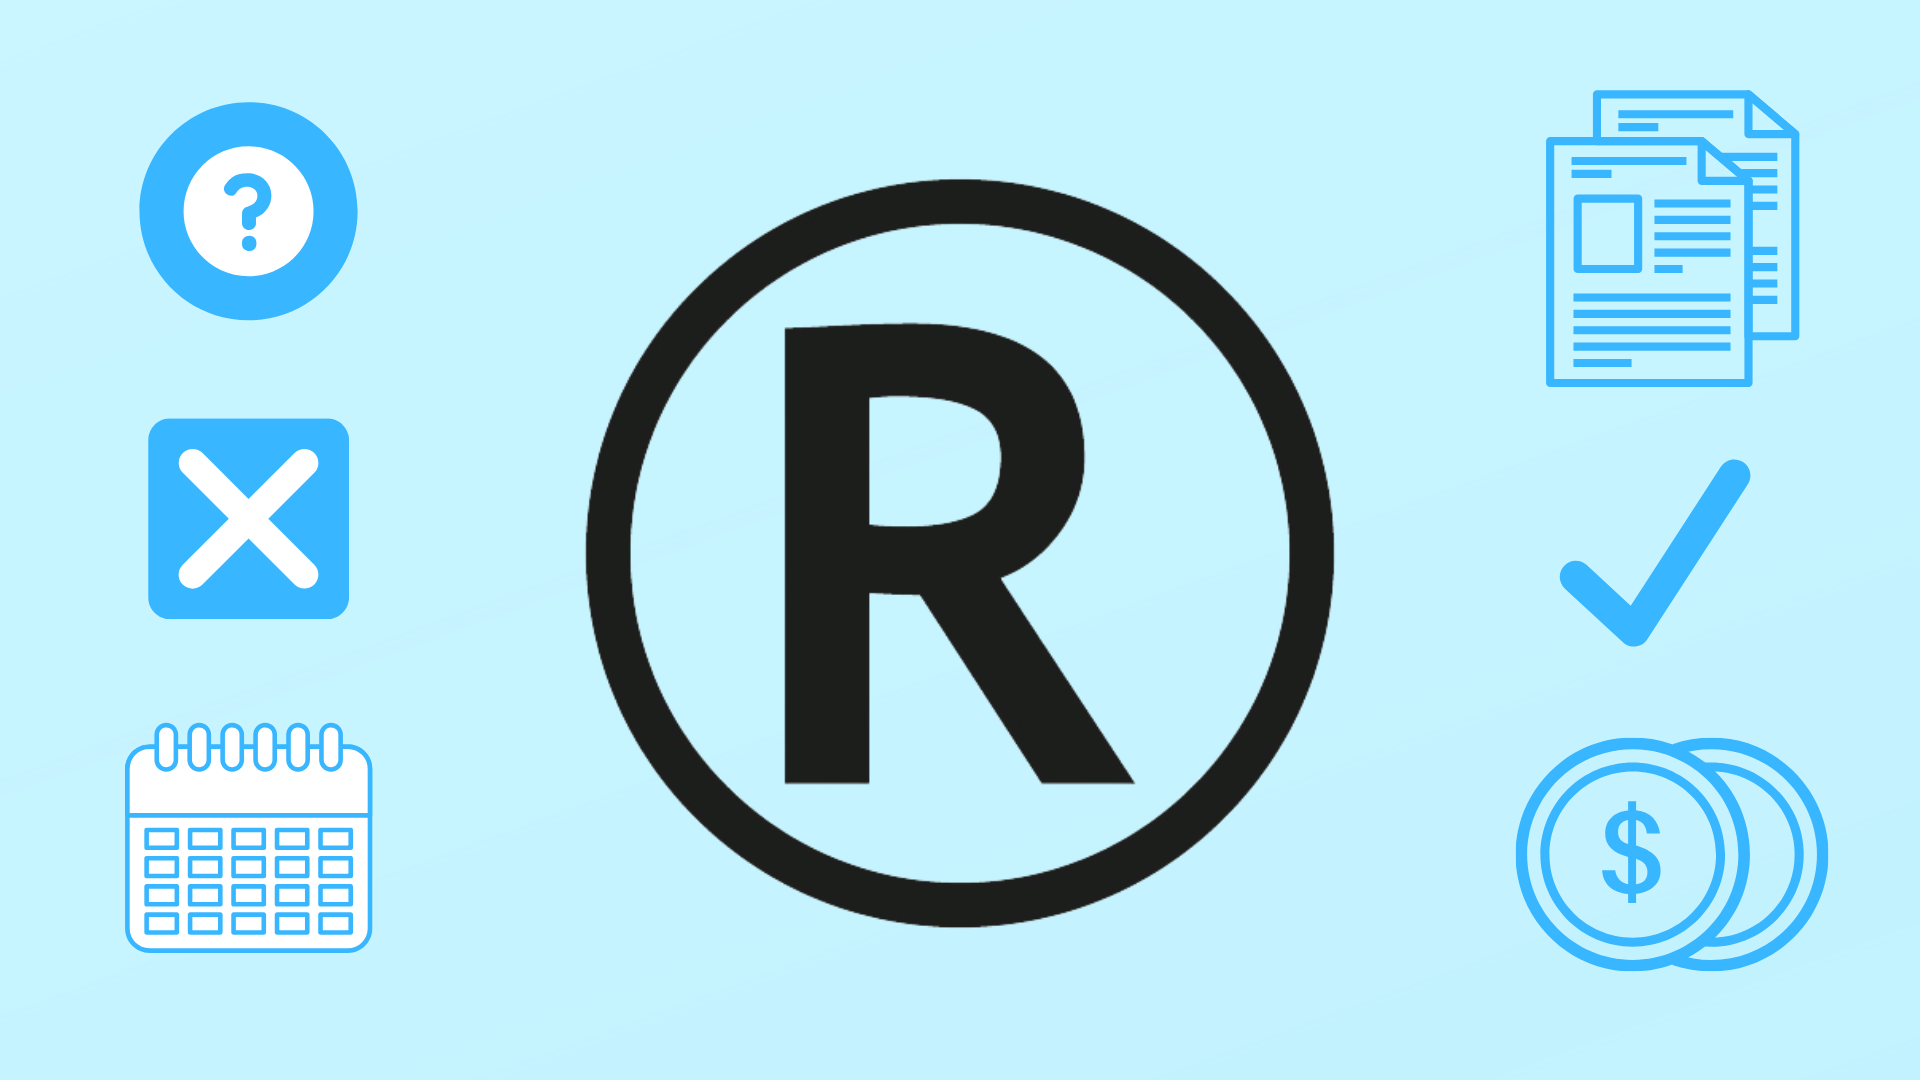 logos trademark